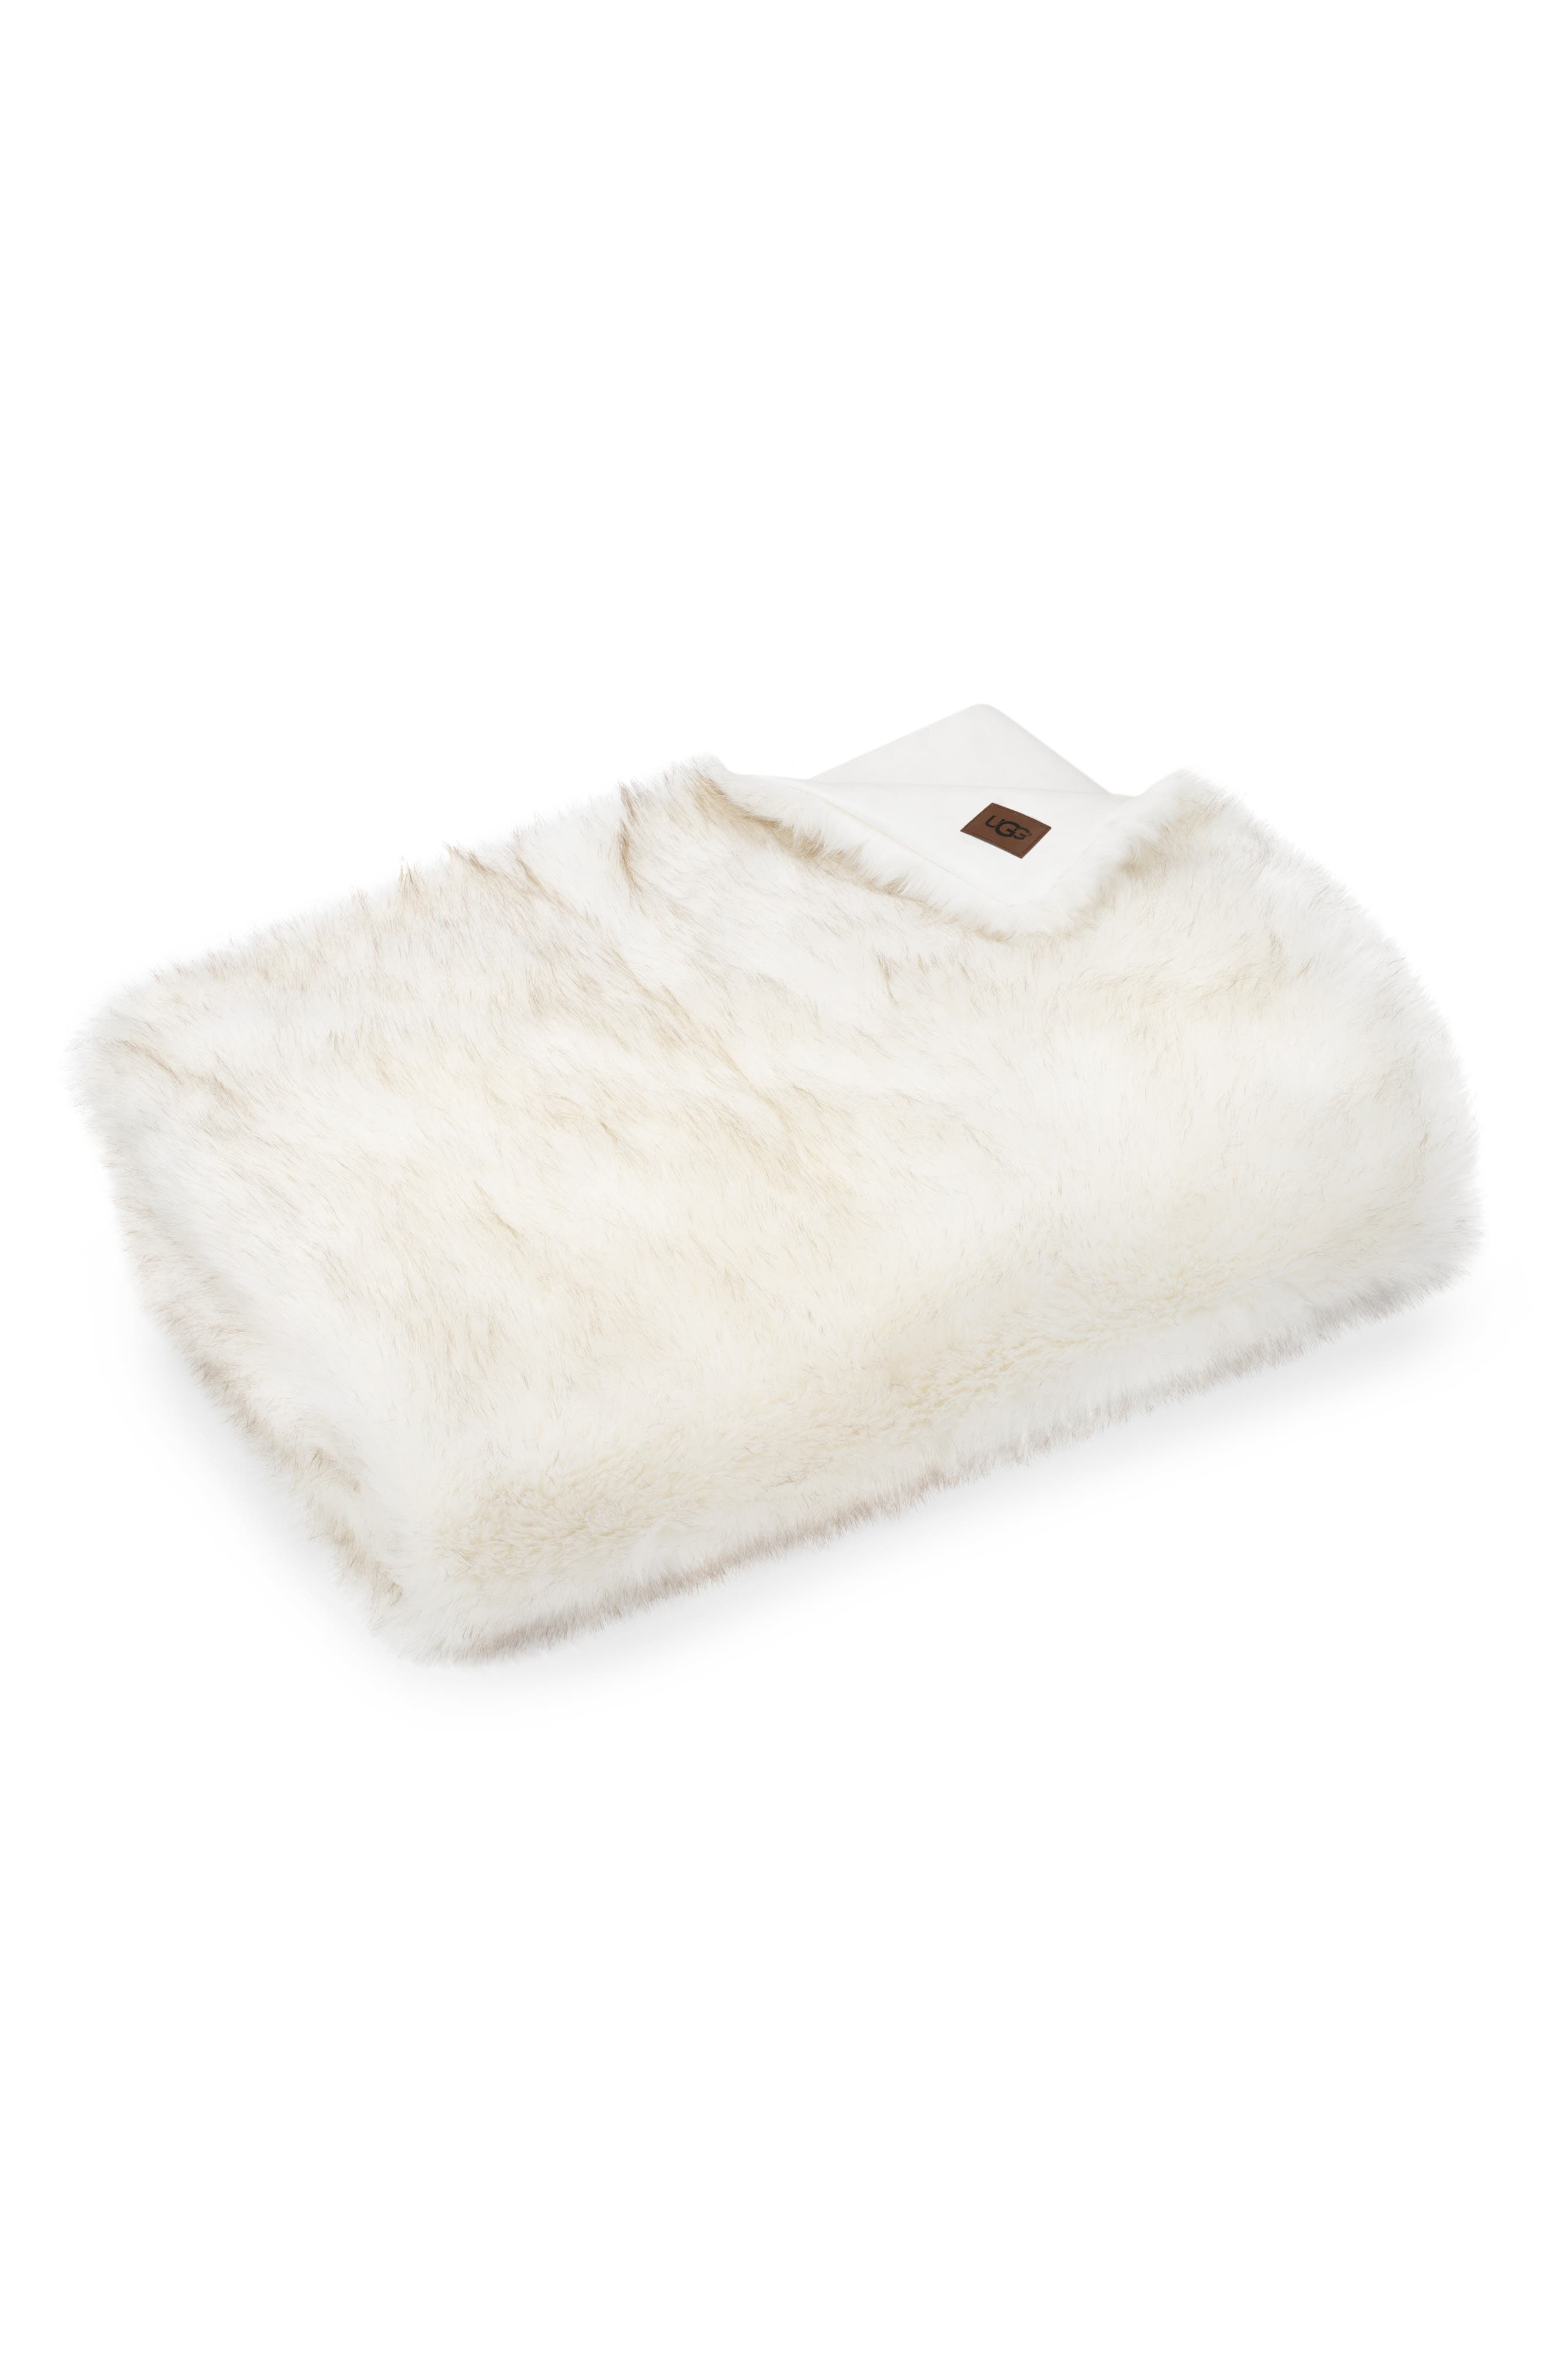 UGG<SUP>®</SUP> Blizzard Faux Fur Blanket, Main, color, NATURAL